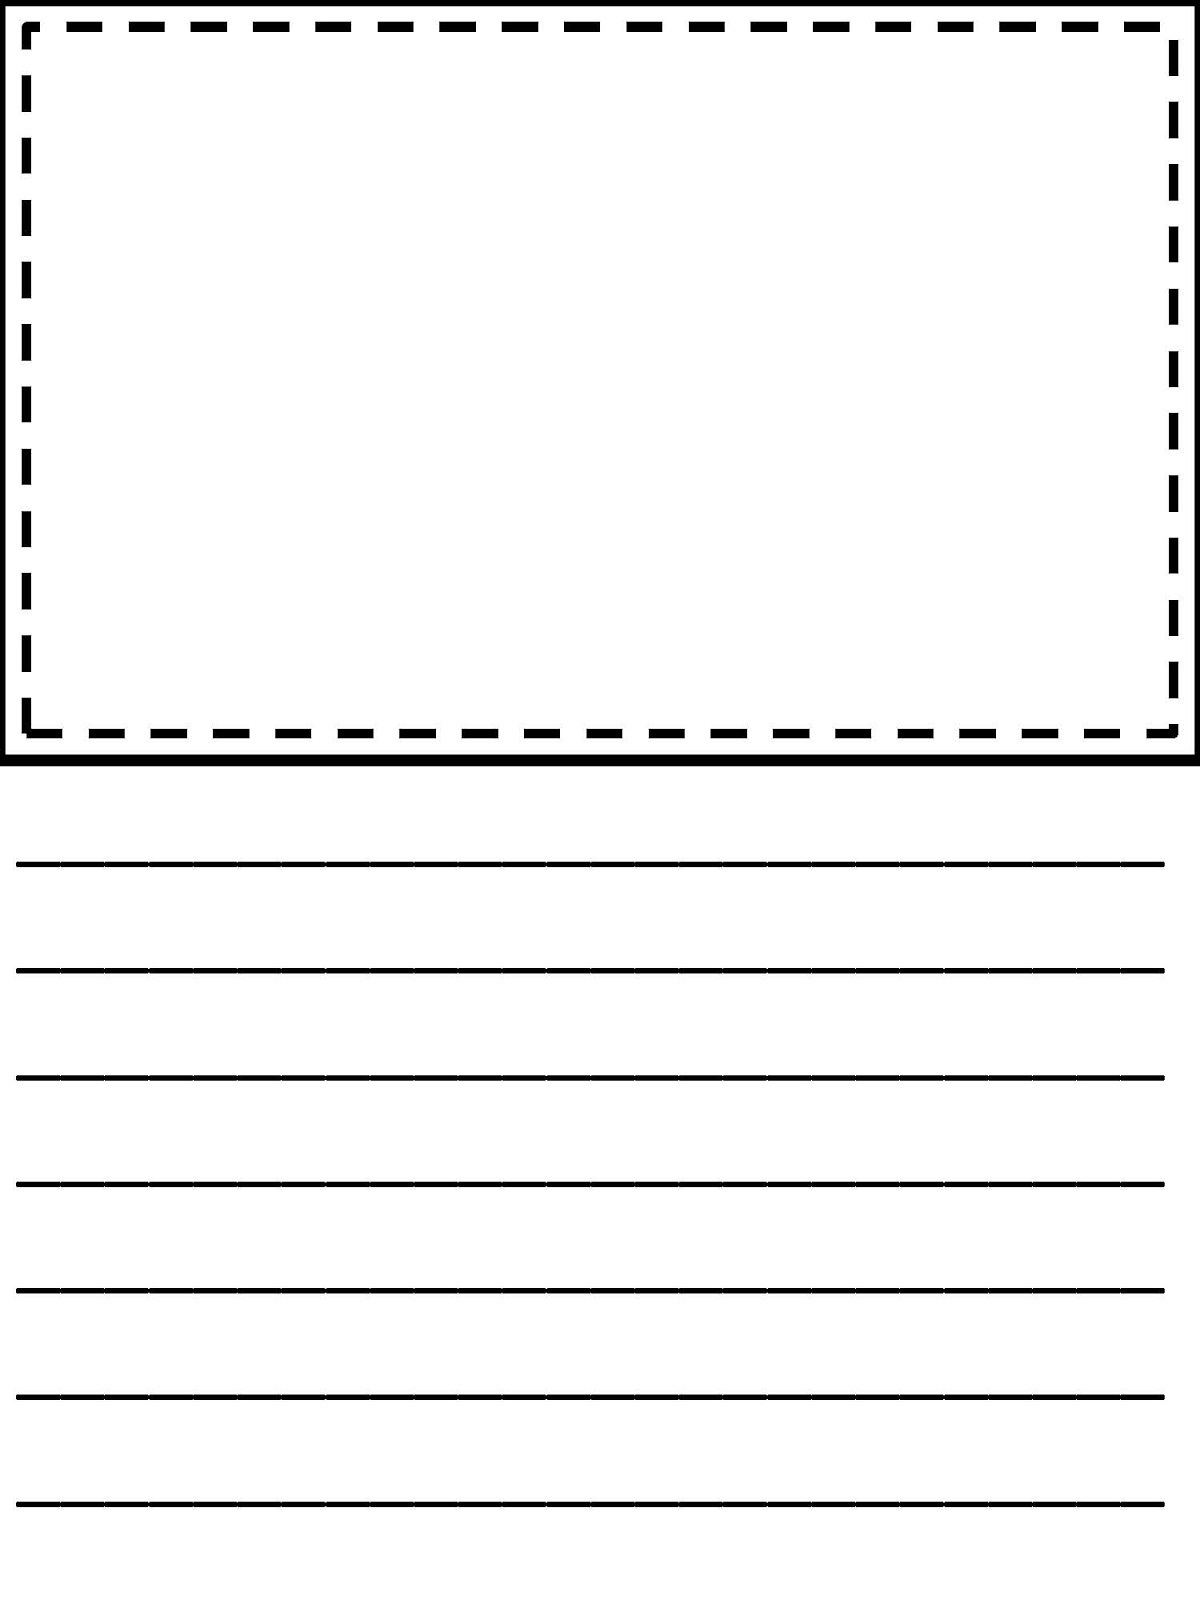 Third Grade Writing Paper   Homeshealth Handwriting Template - Free Printable Writing Paper